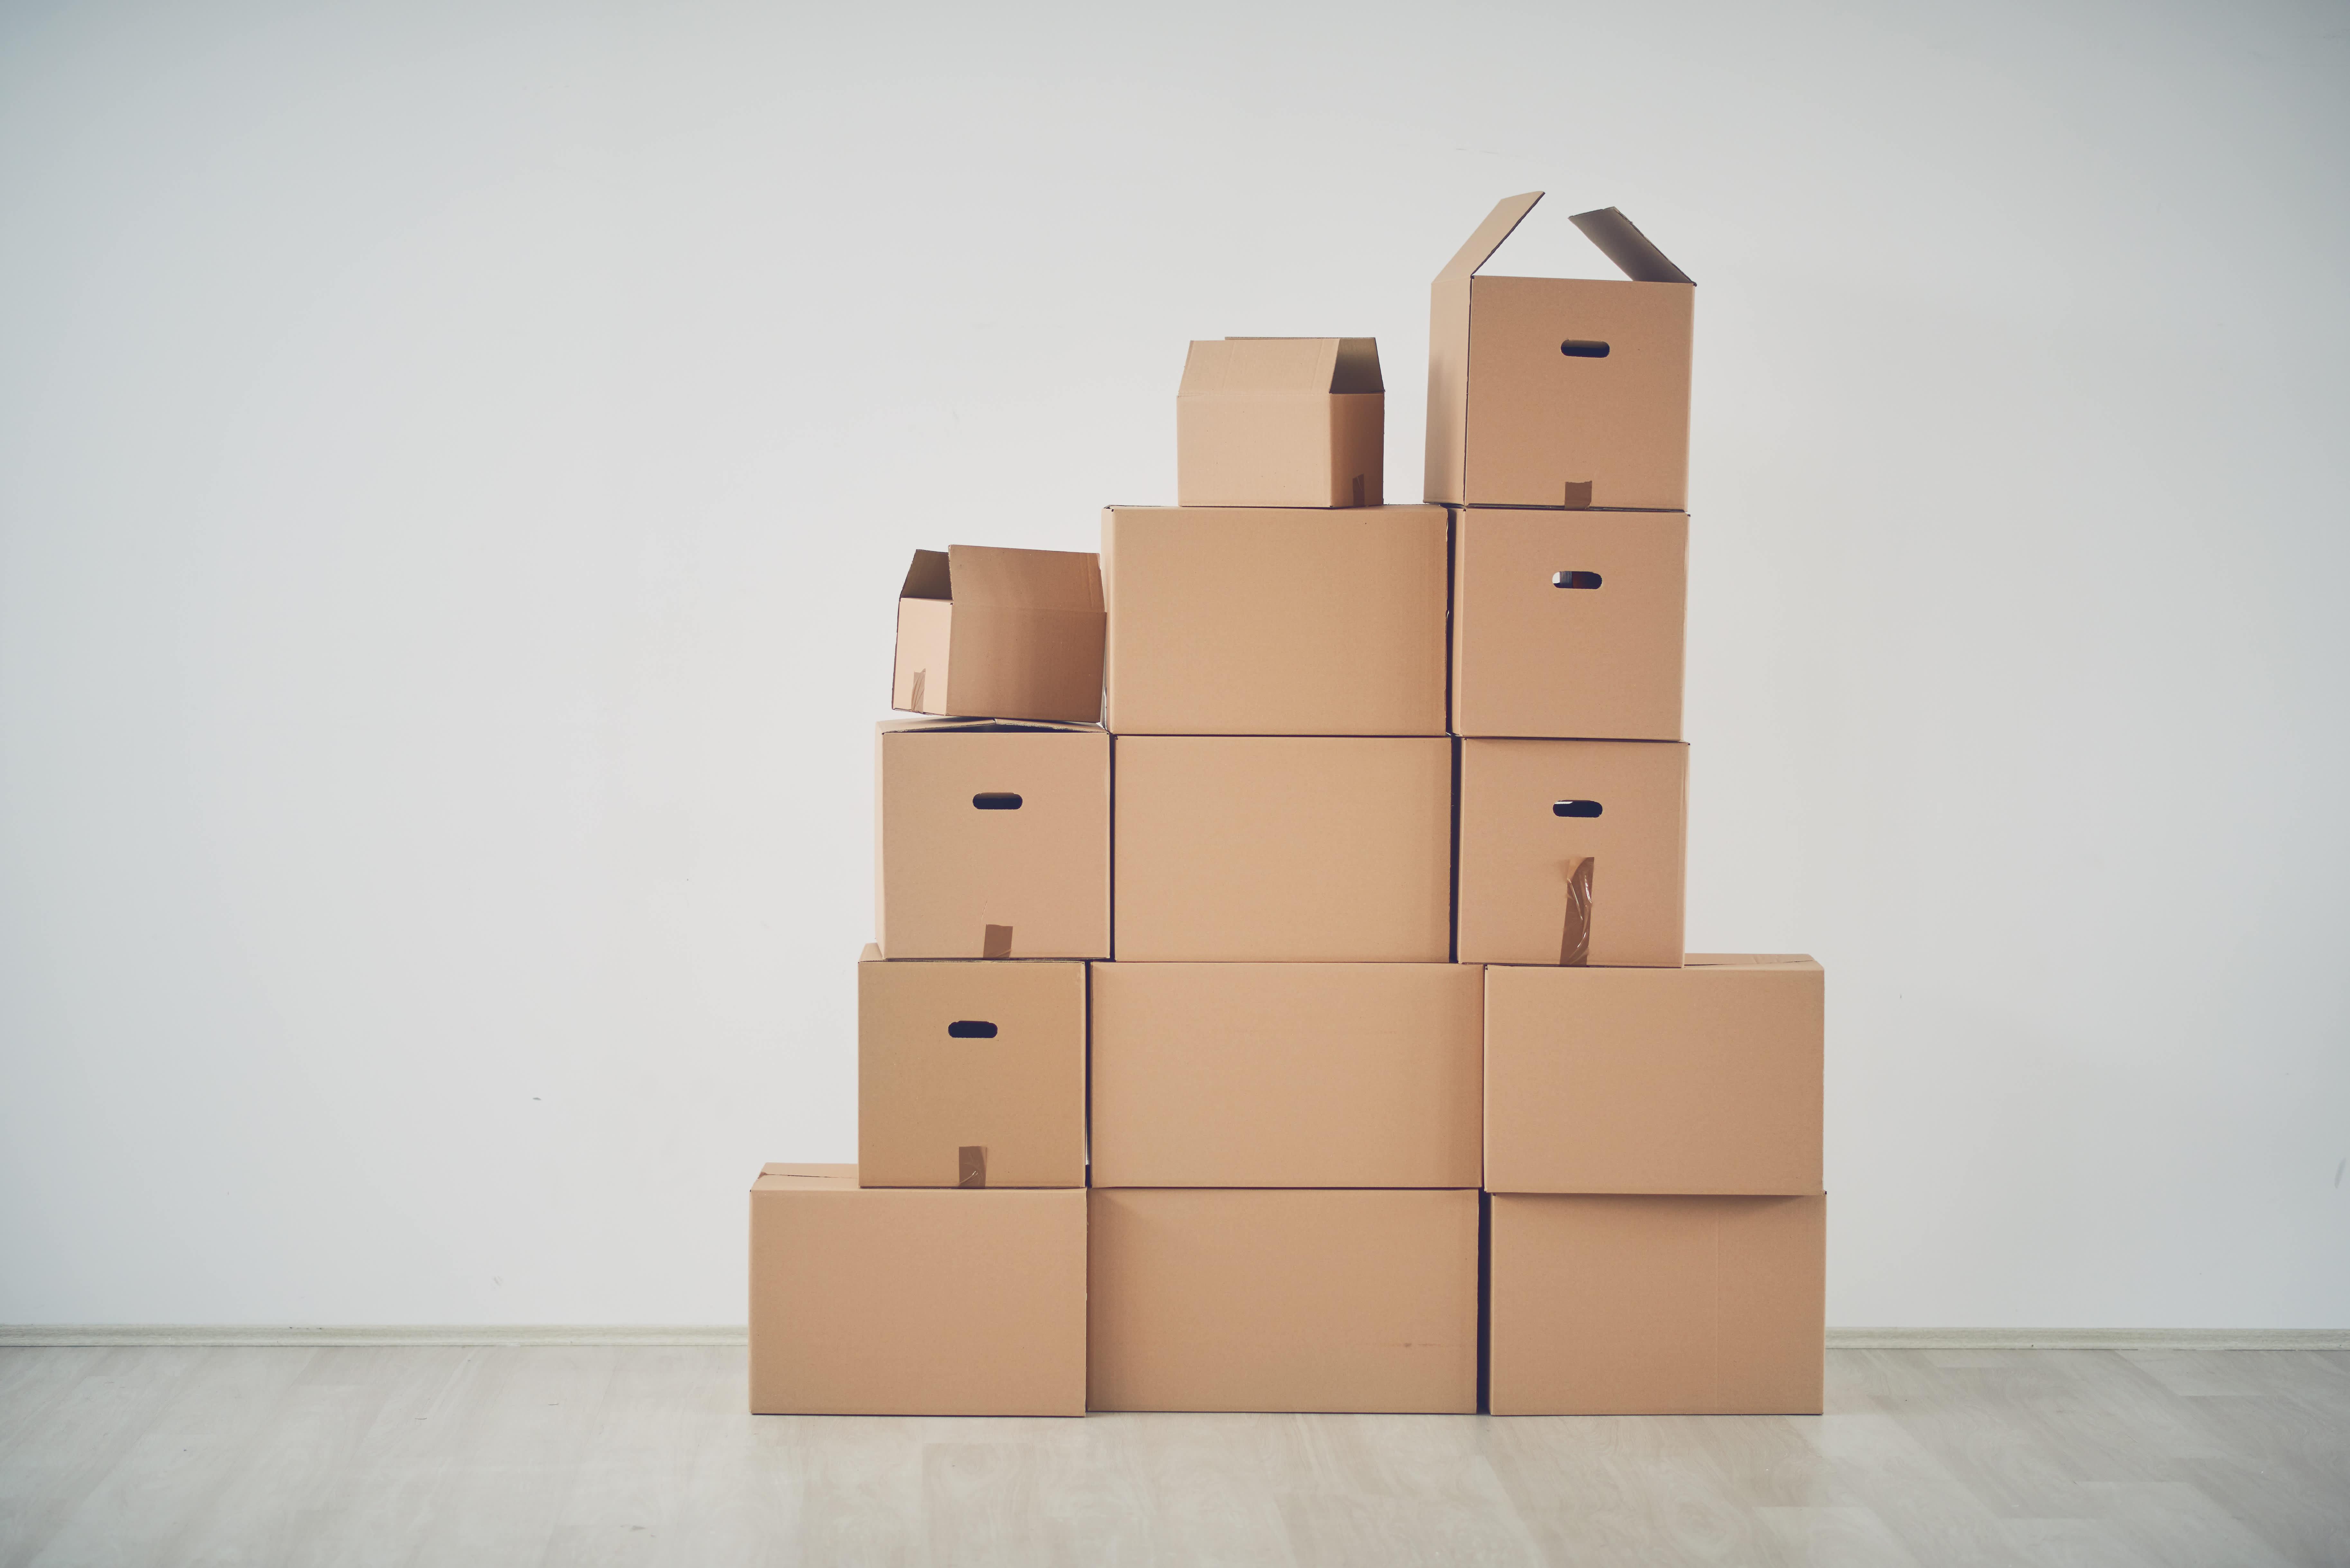 Transport de cartons